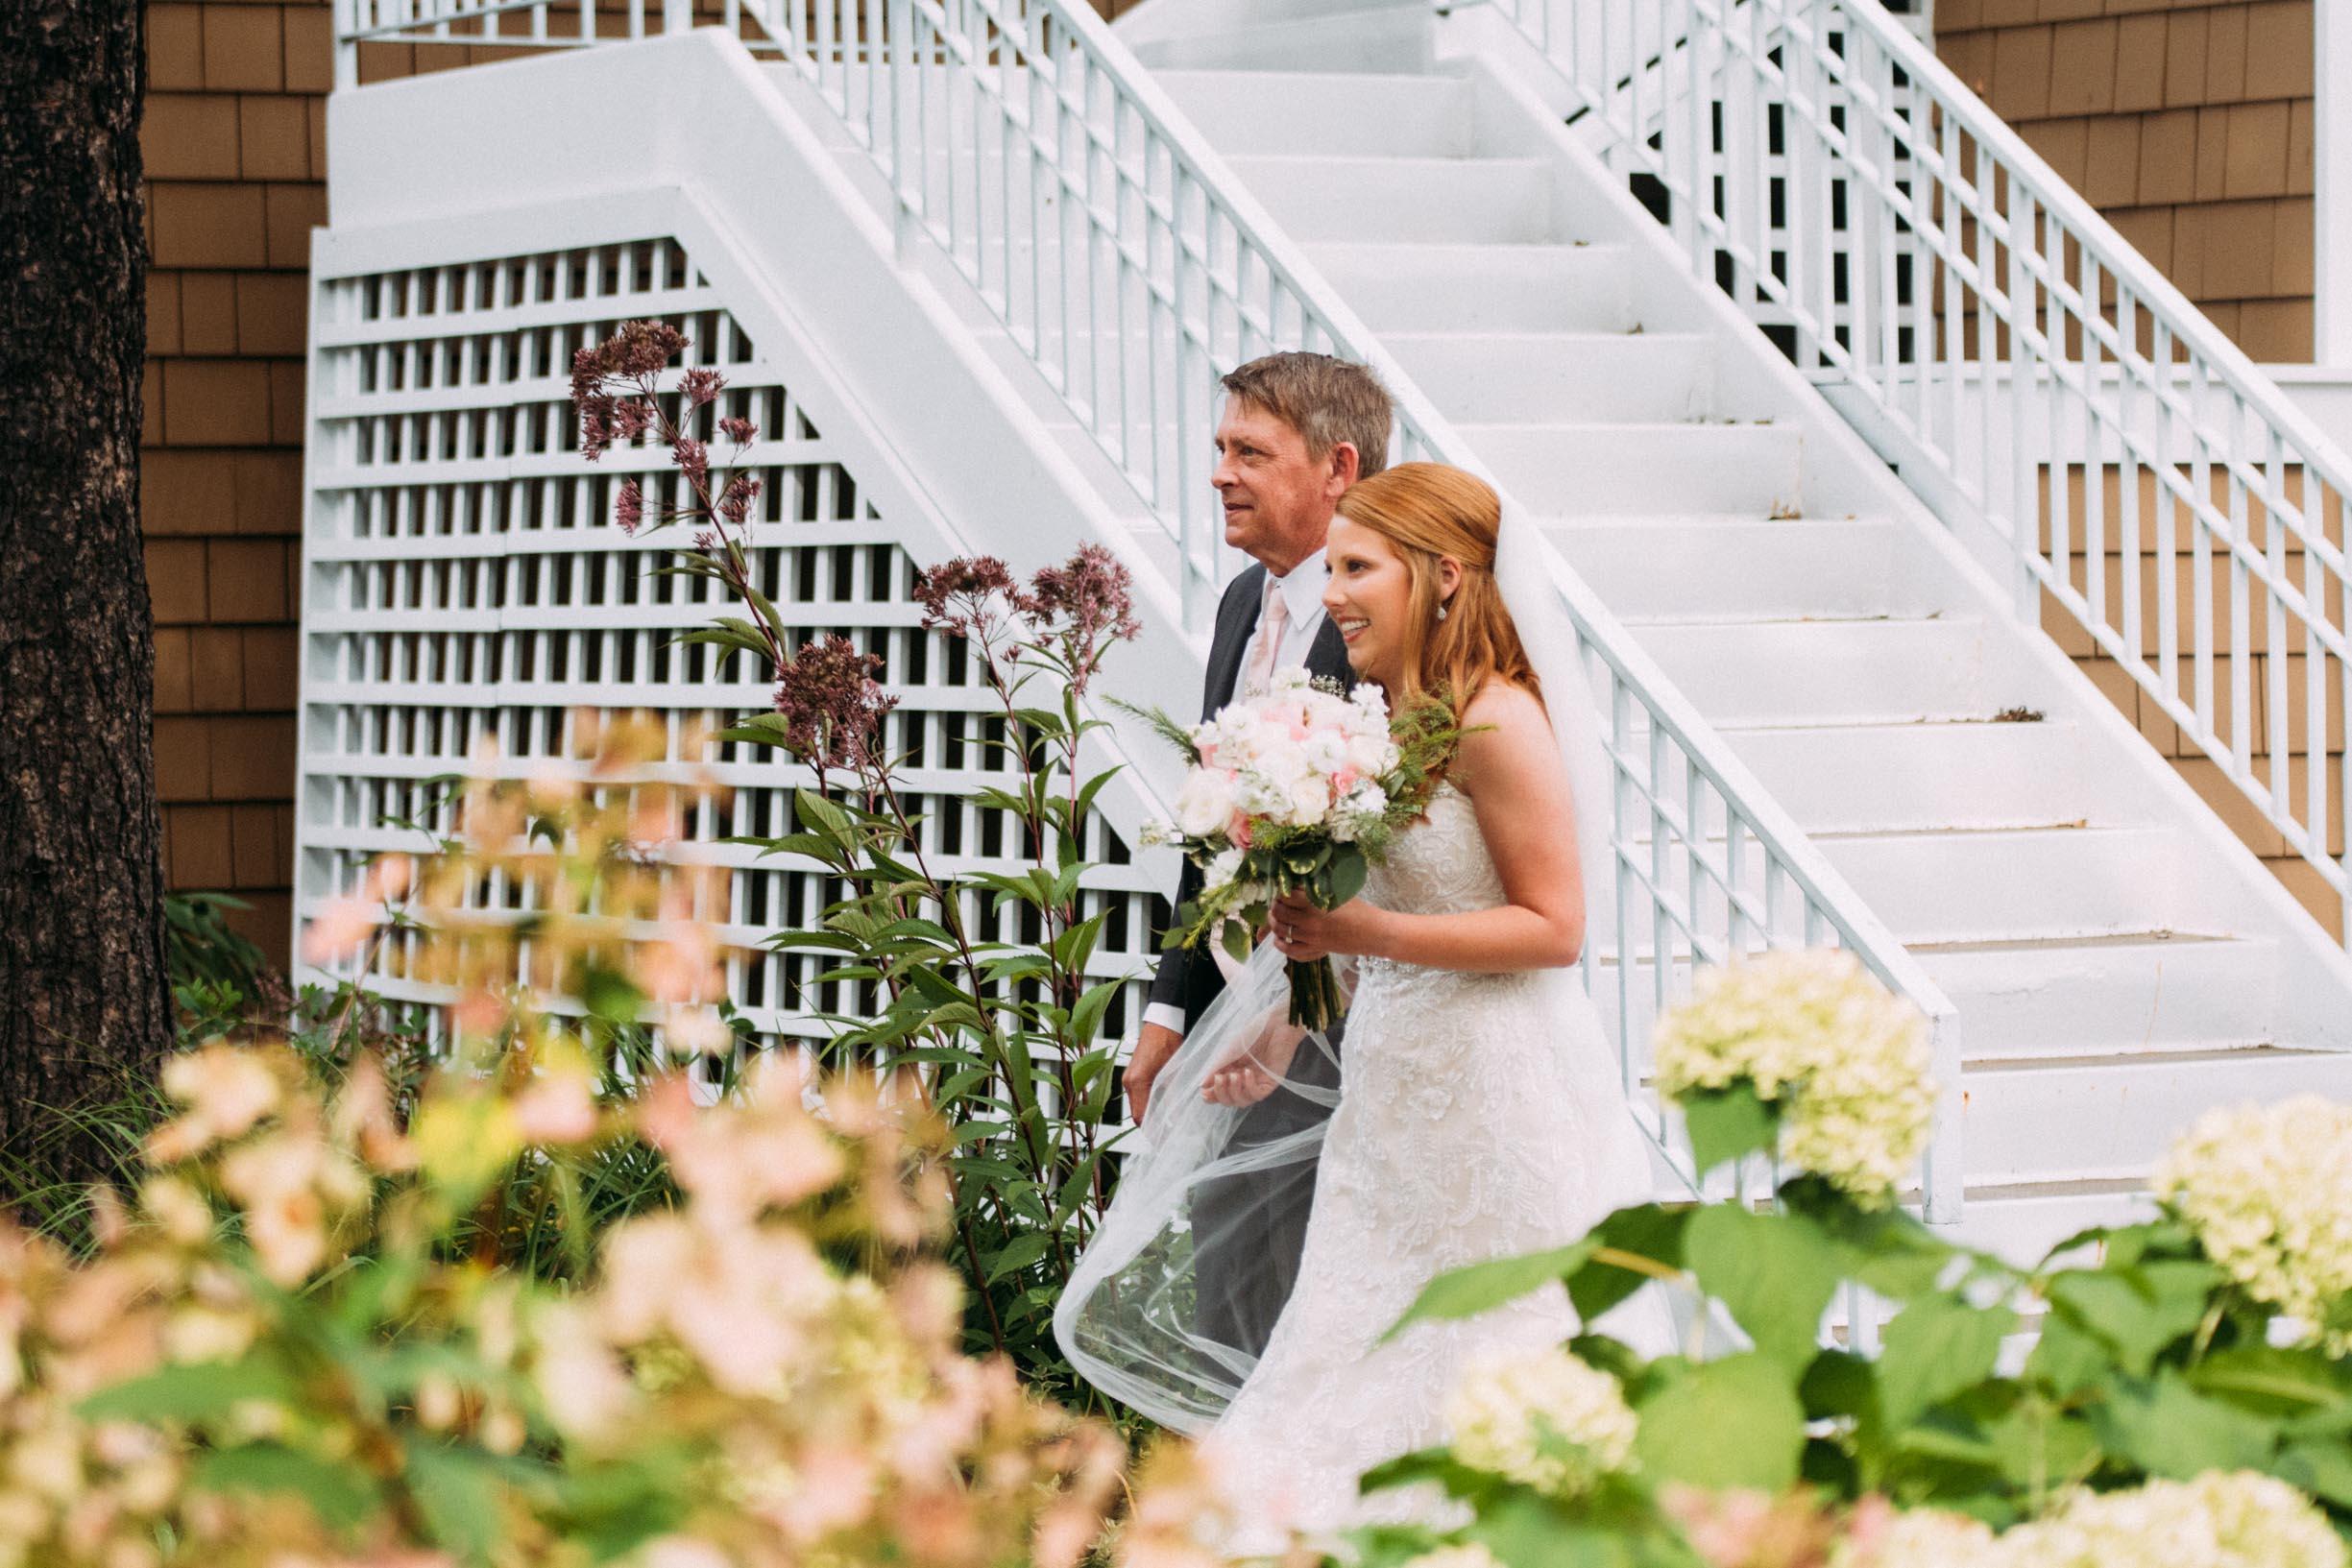 Megan_Zach_Minneapolis_Wedding_Ceremony_Blog-34.jpg